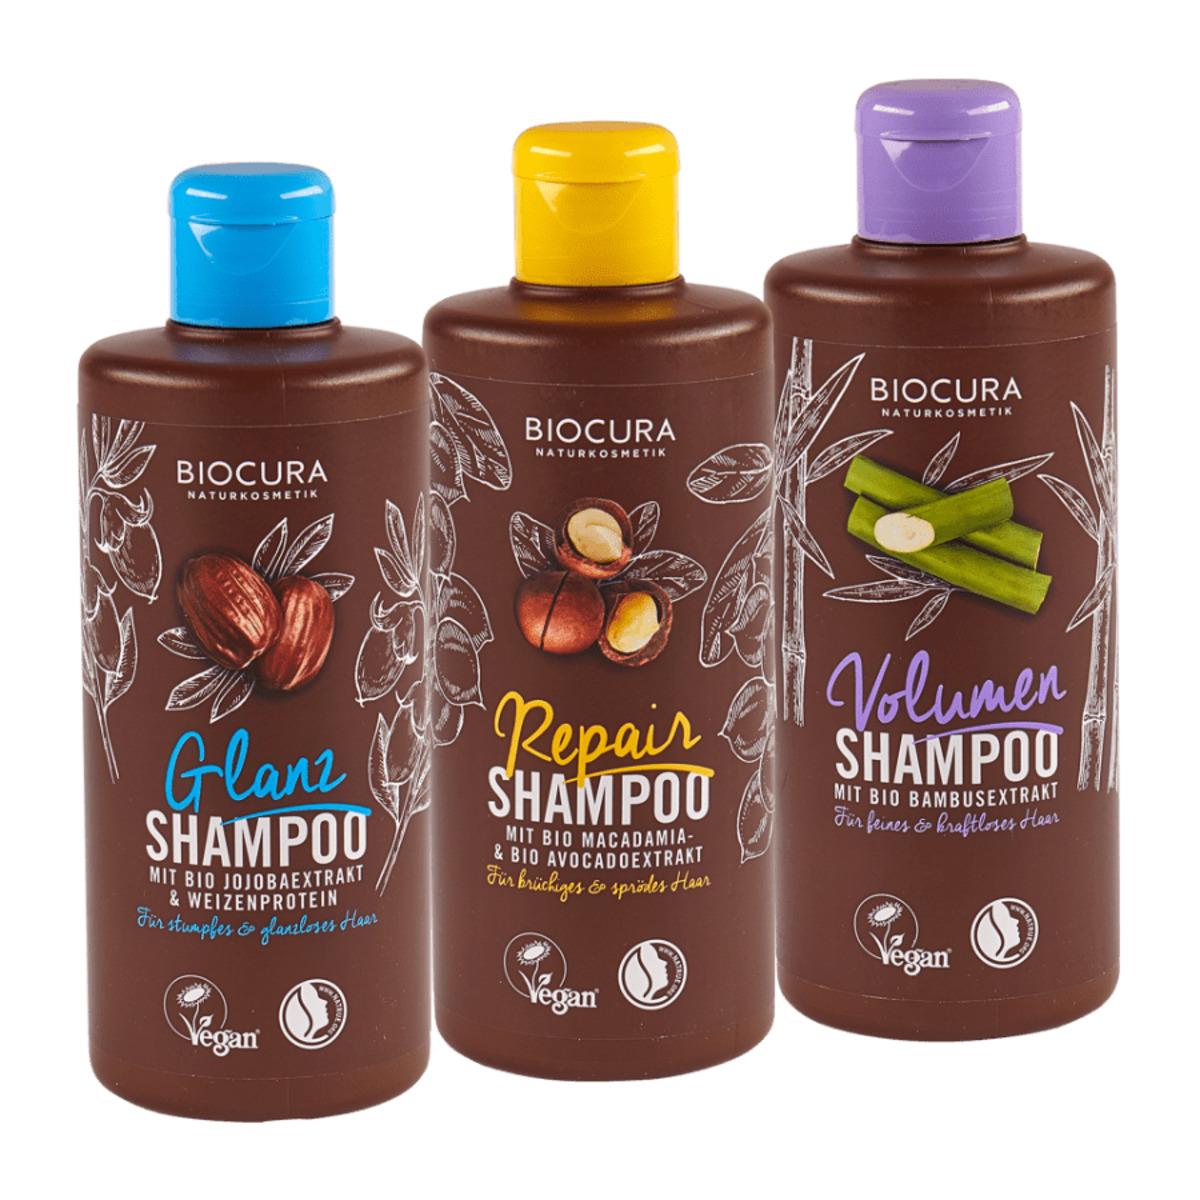 Bild 1 von BIOCURA     Shampoo